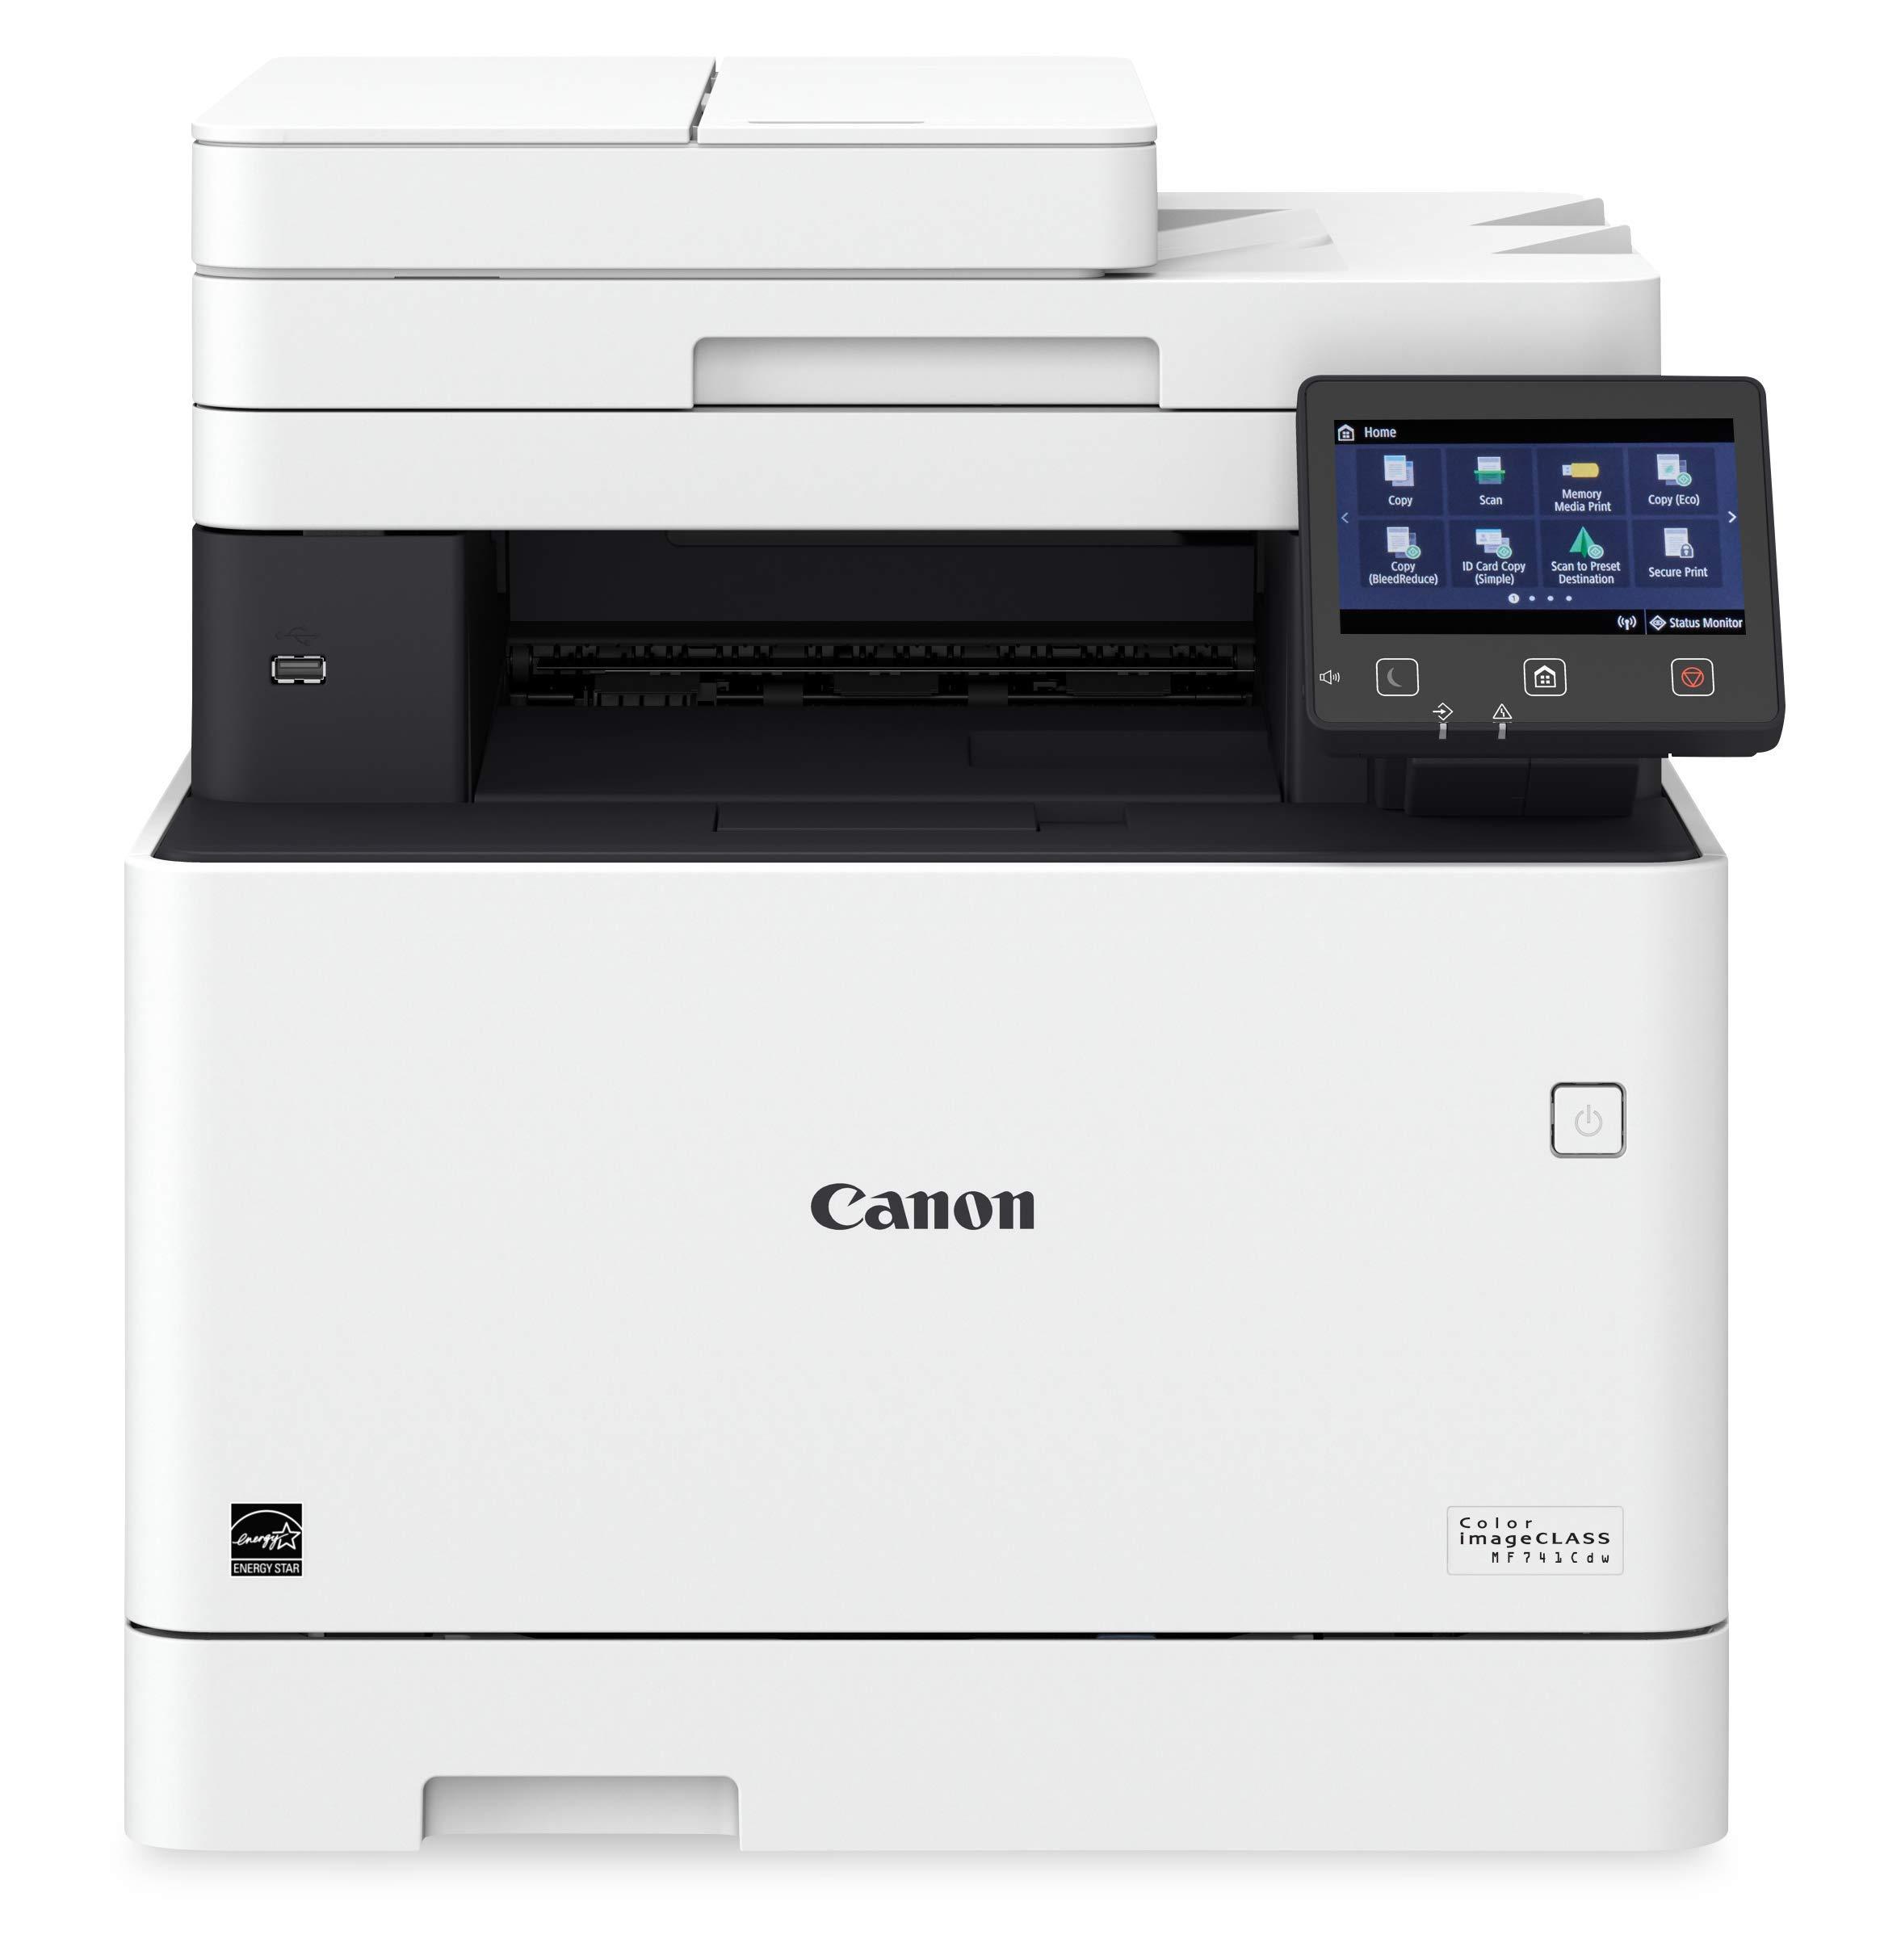 Canon Color imageCLASS MF741Cdw Multifunction